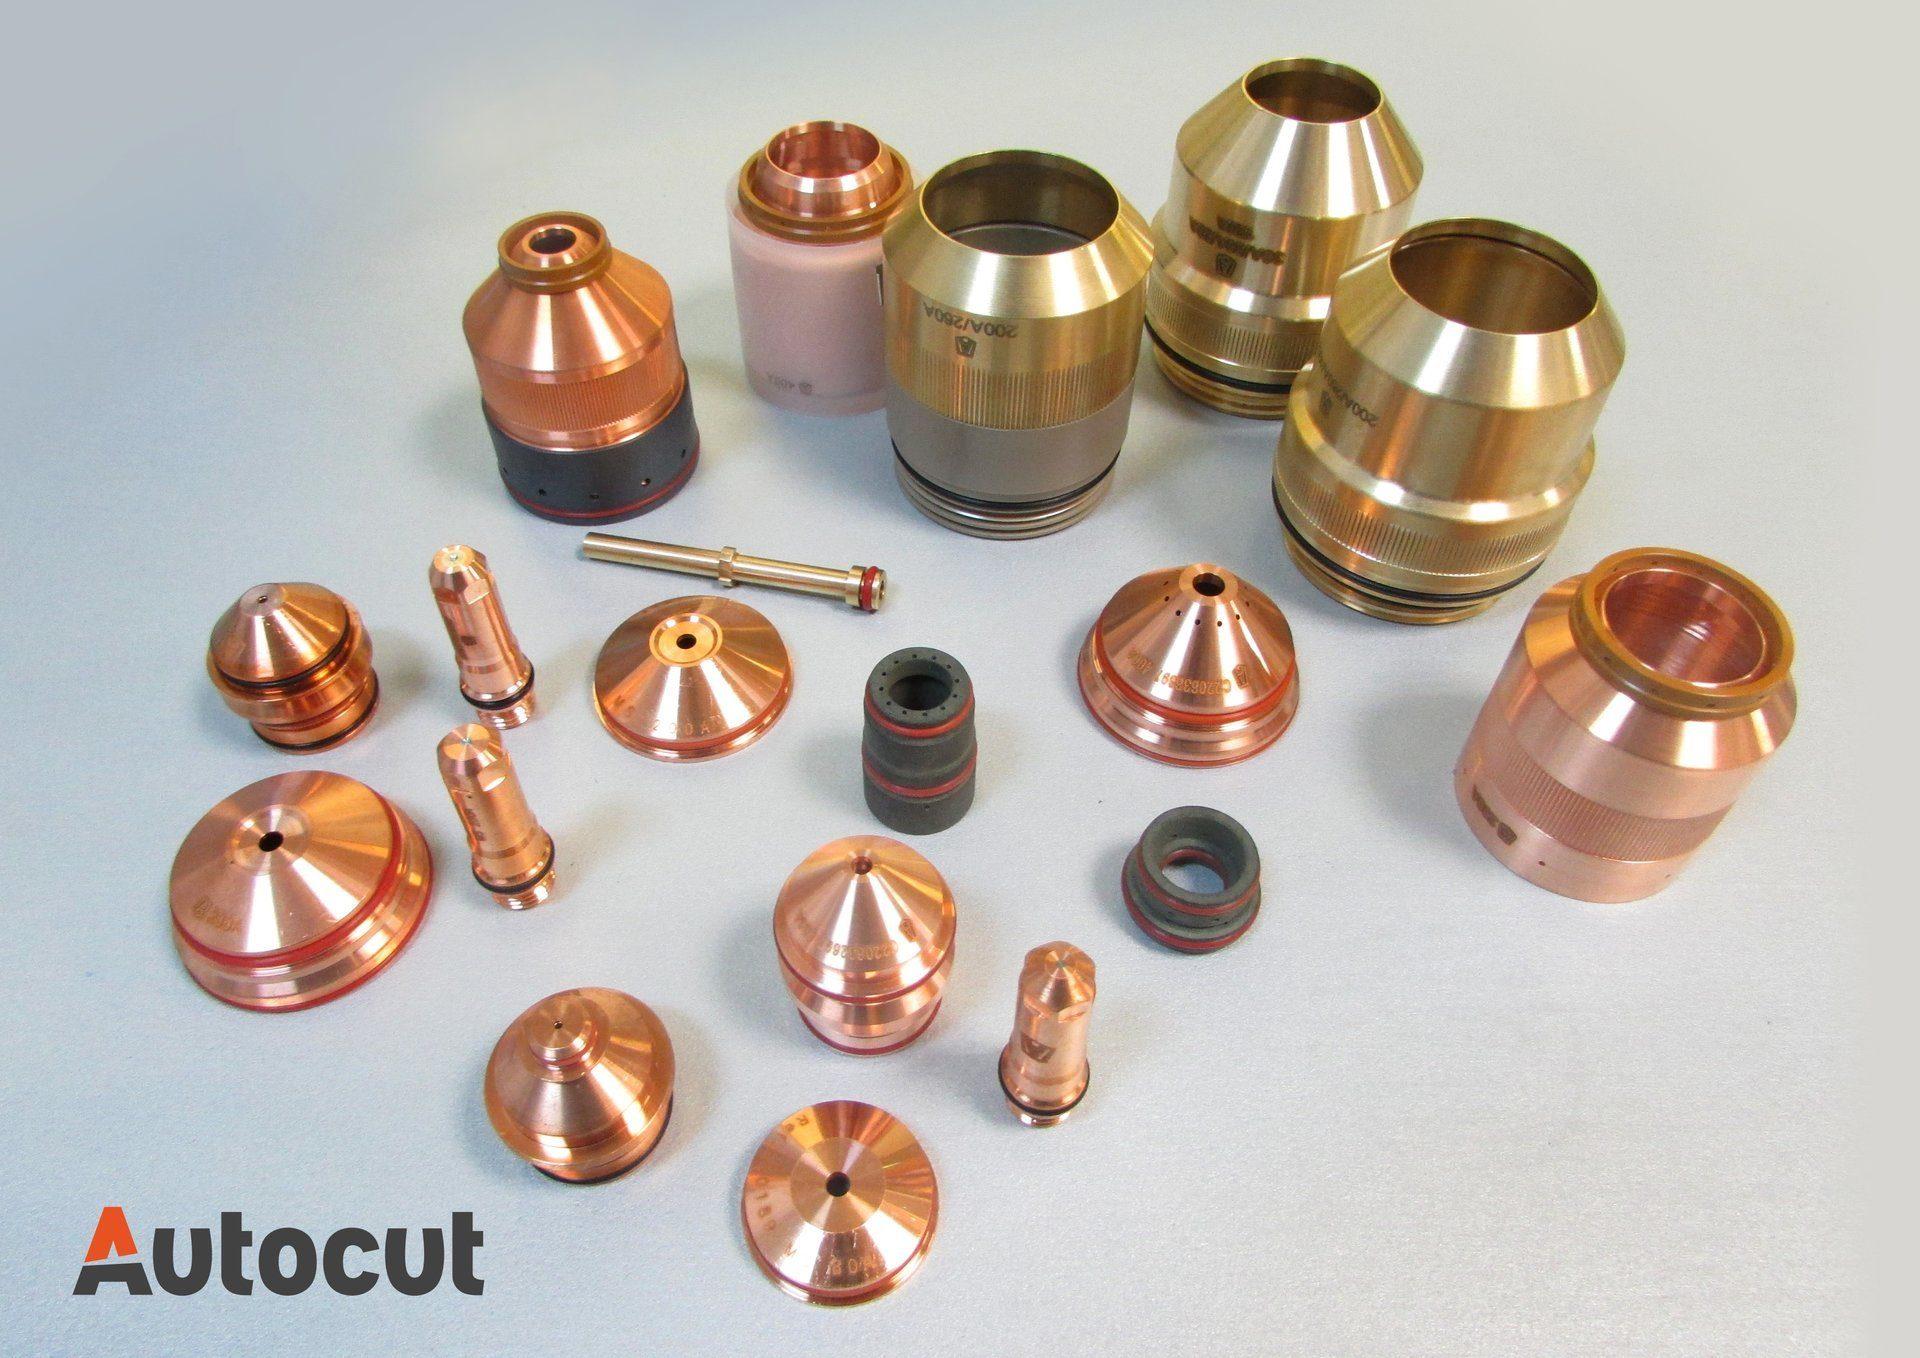 Basic tips to improve plasma cut quality on metal